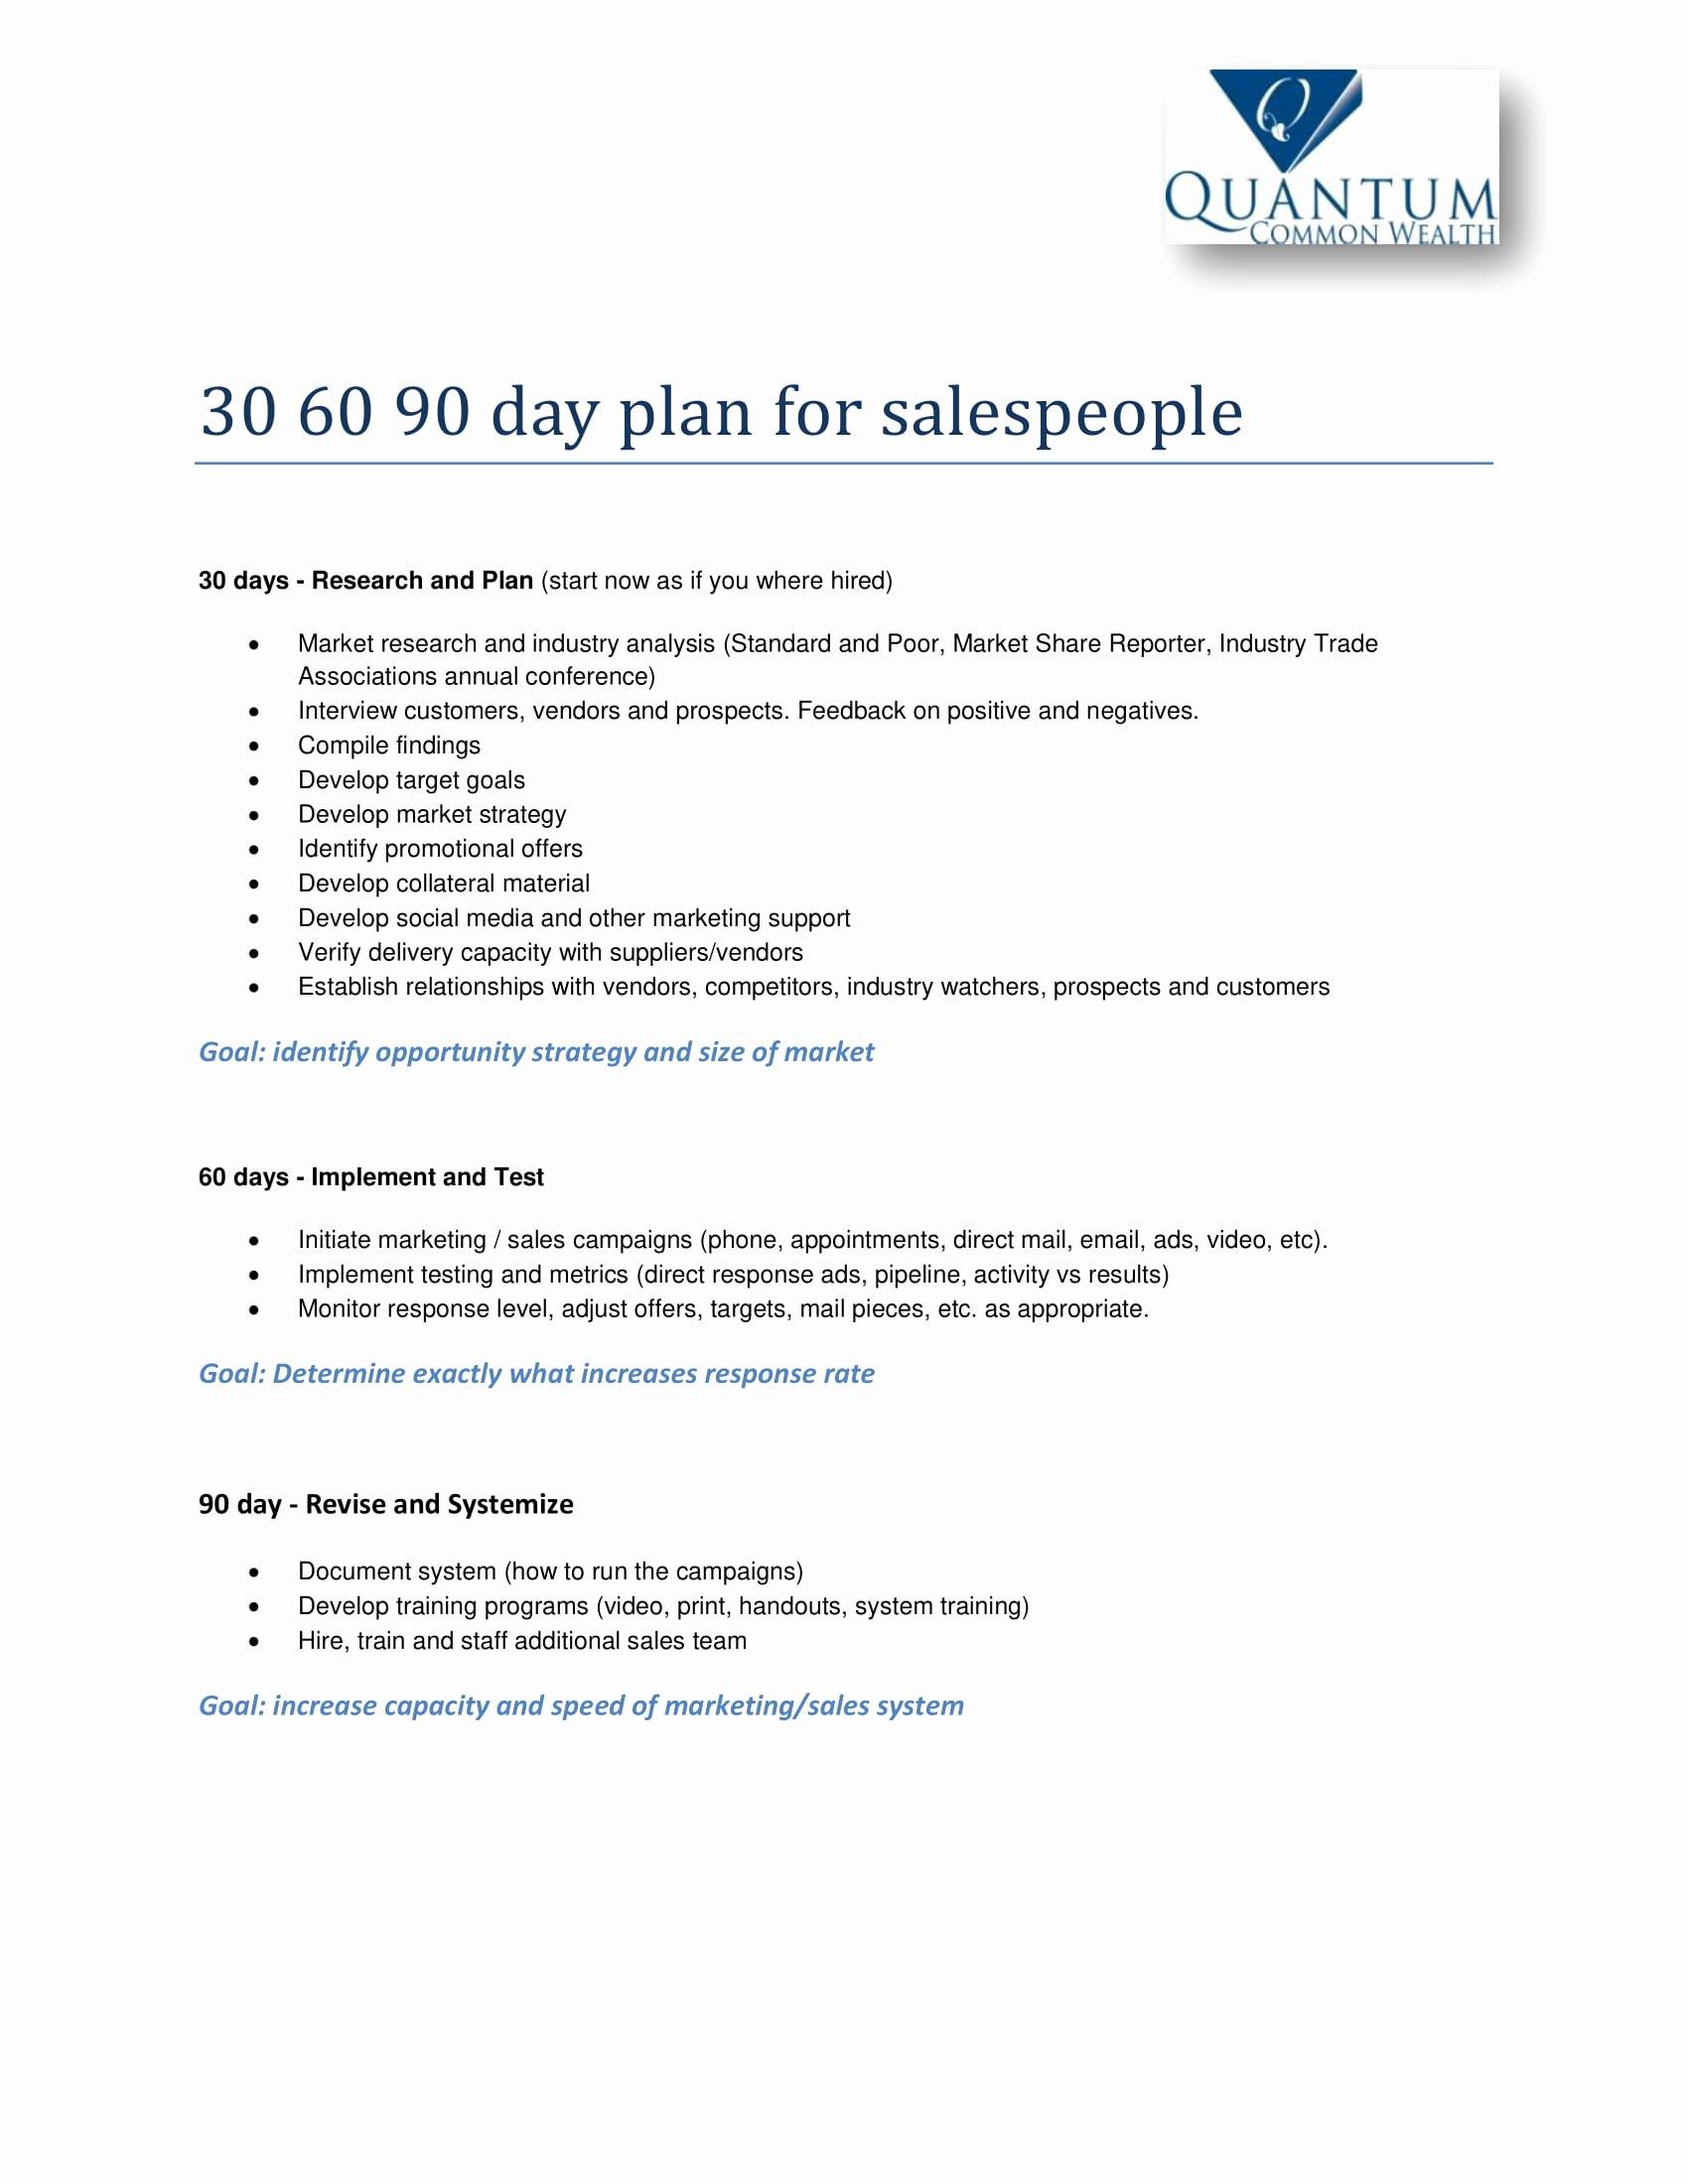 30 60 90 Plan Templates Luxury 12 30 60 90 Day Sales Plan Examples Pdf Word